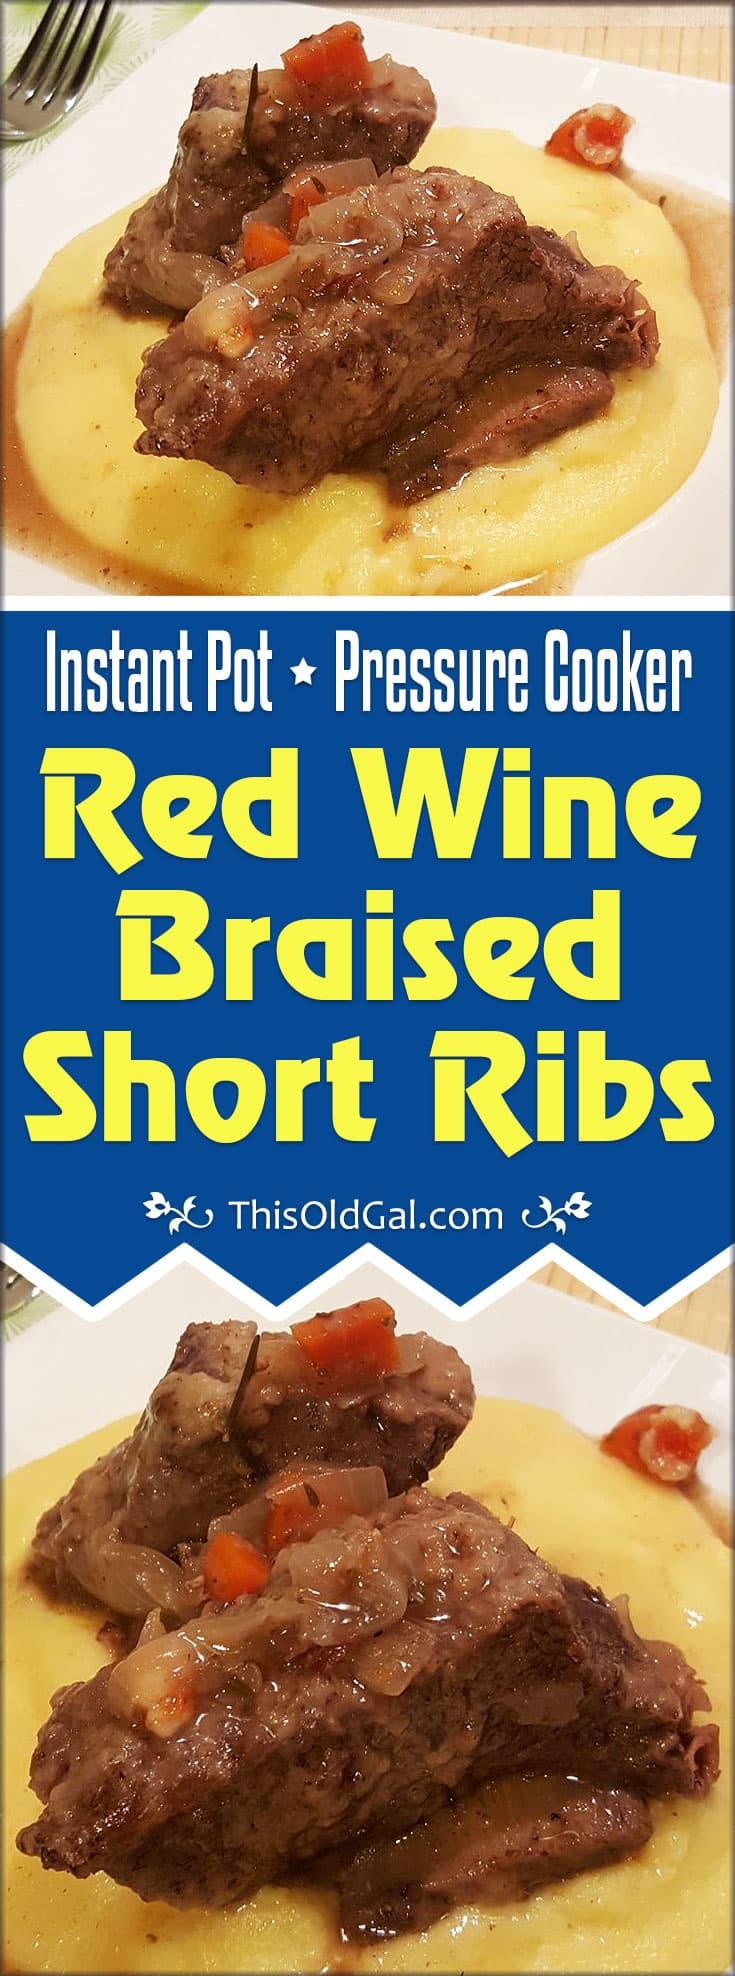 Pressure Cooker Red Wine Braised Short Ribs